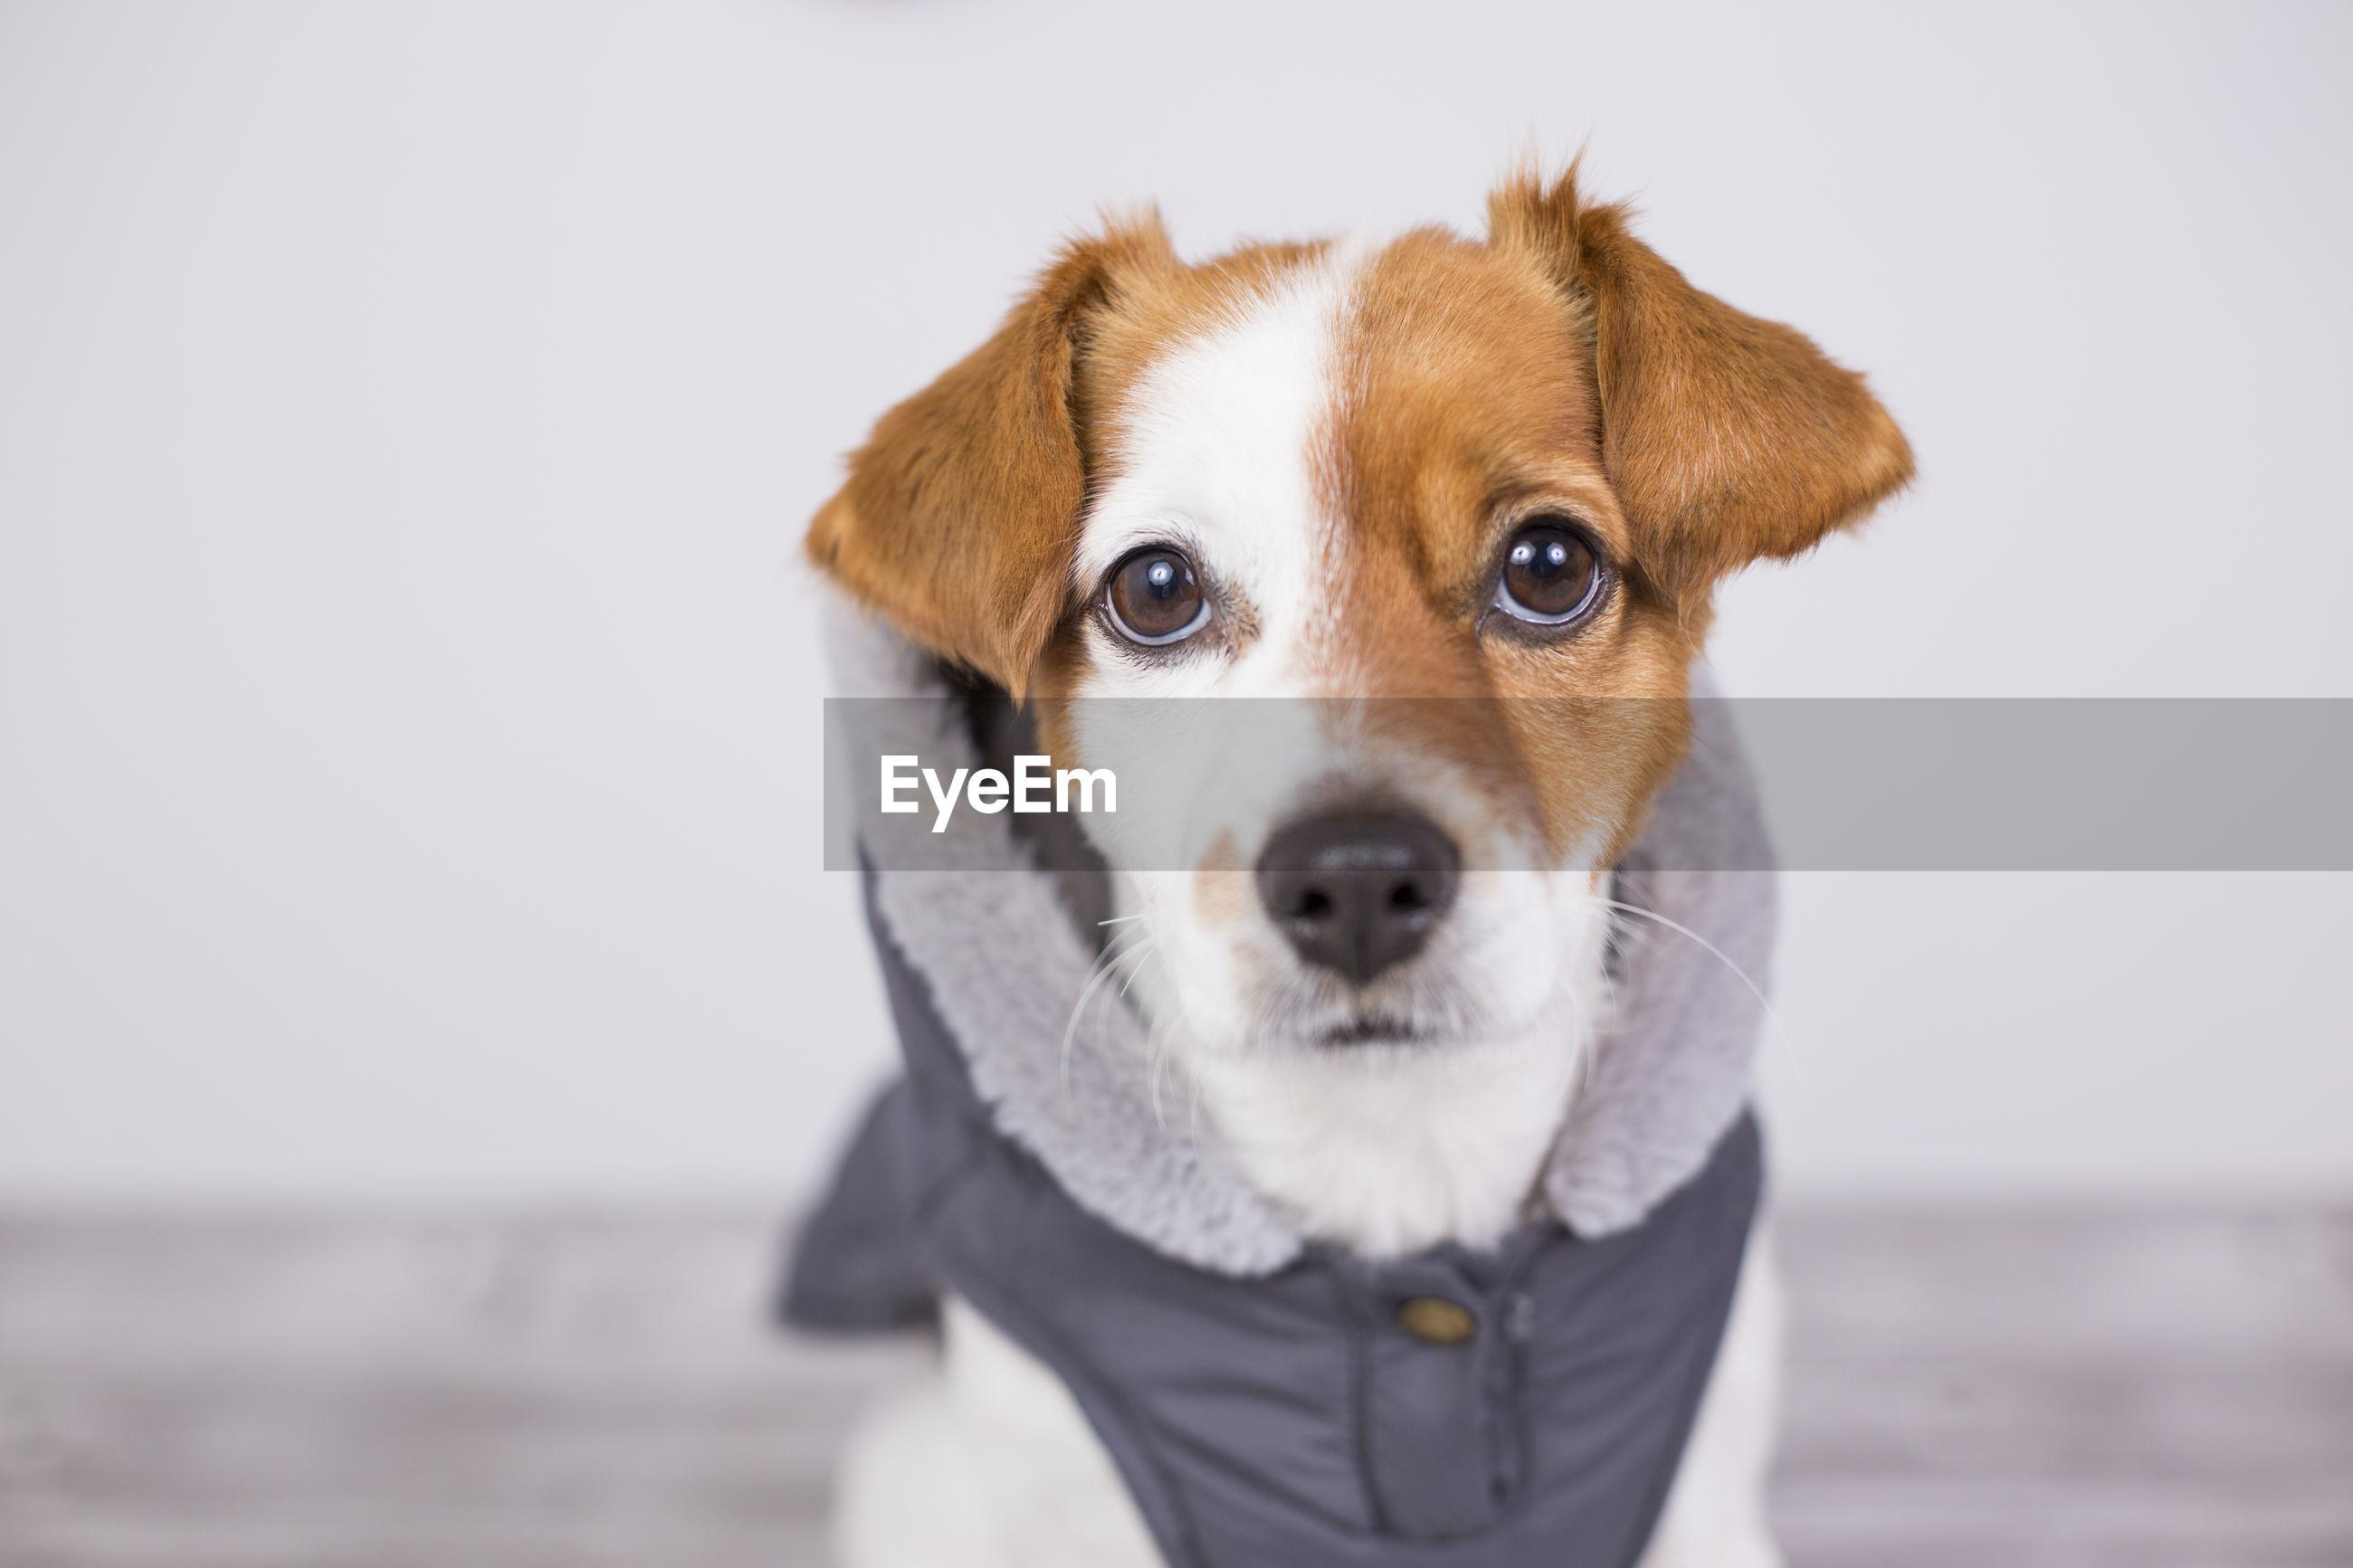 Close-up portrait of dog sitting against white background